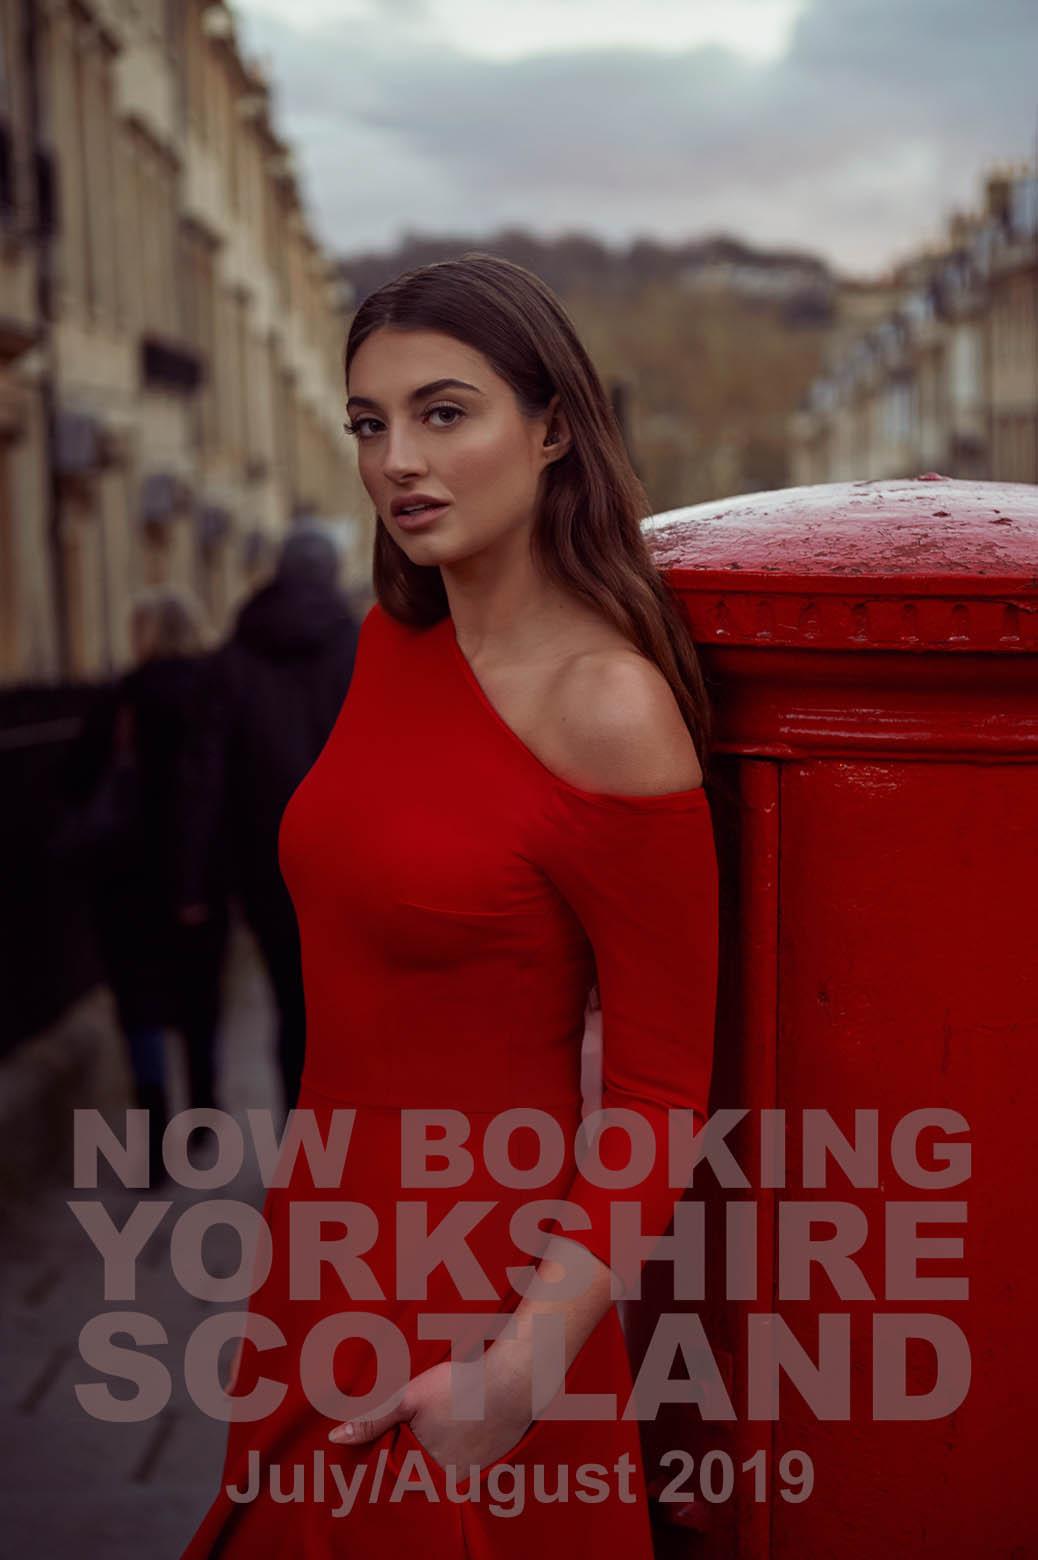 england, uk, scotland, travel, photoshoot, destination photo shoot, ursula schmitz, travel photographer